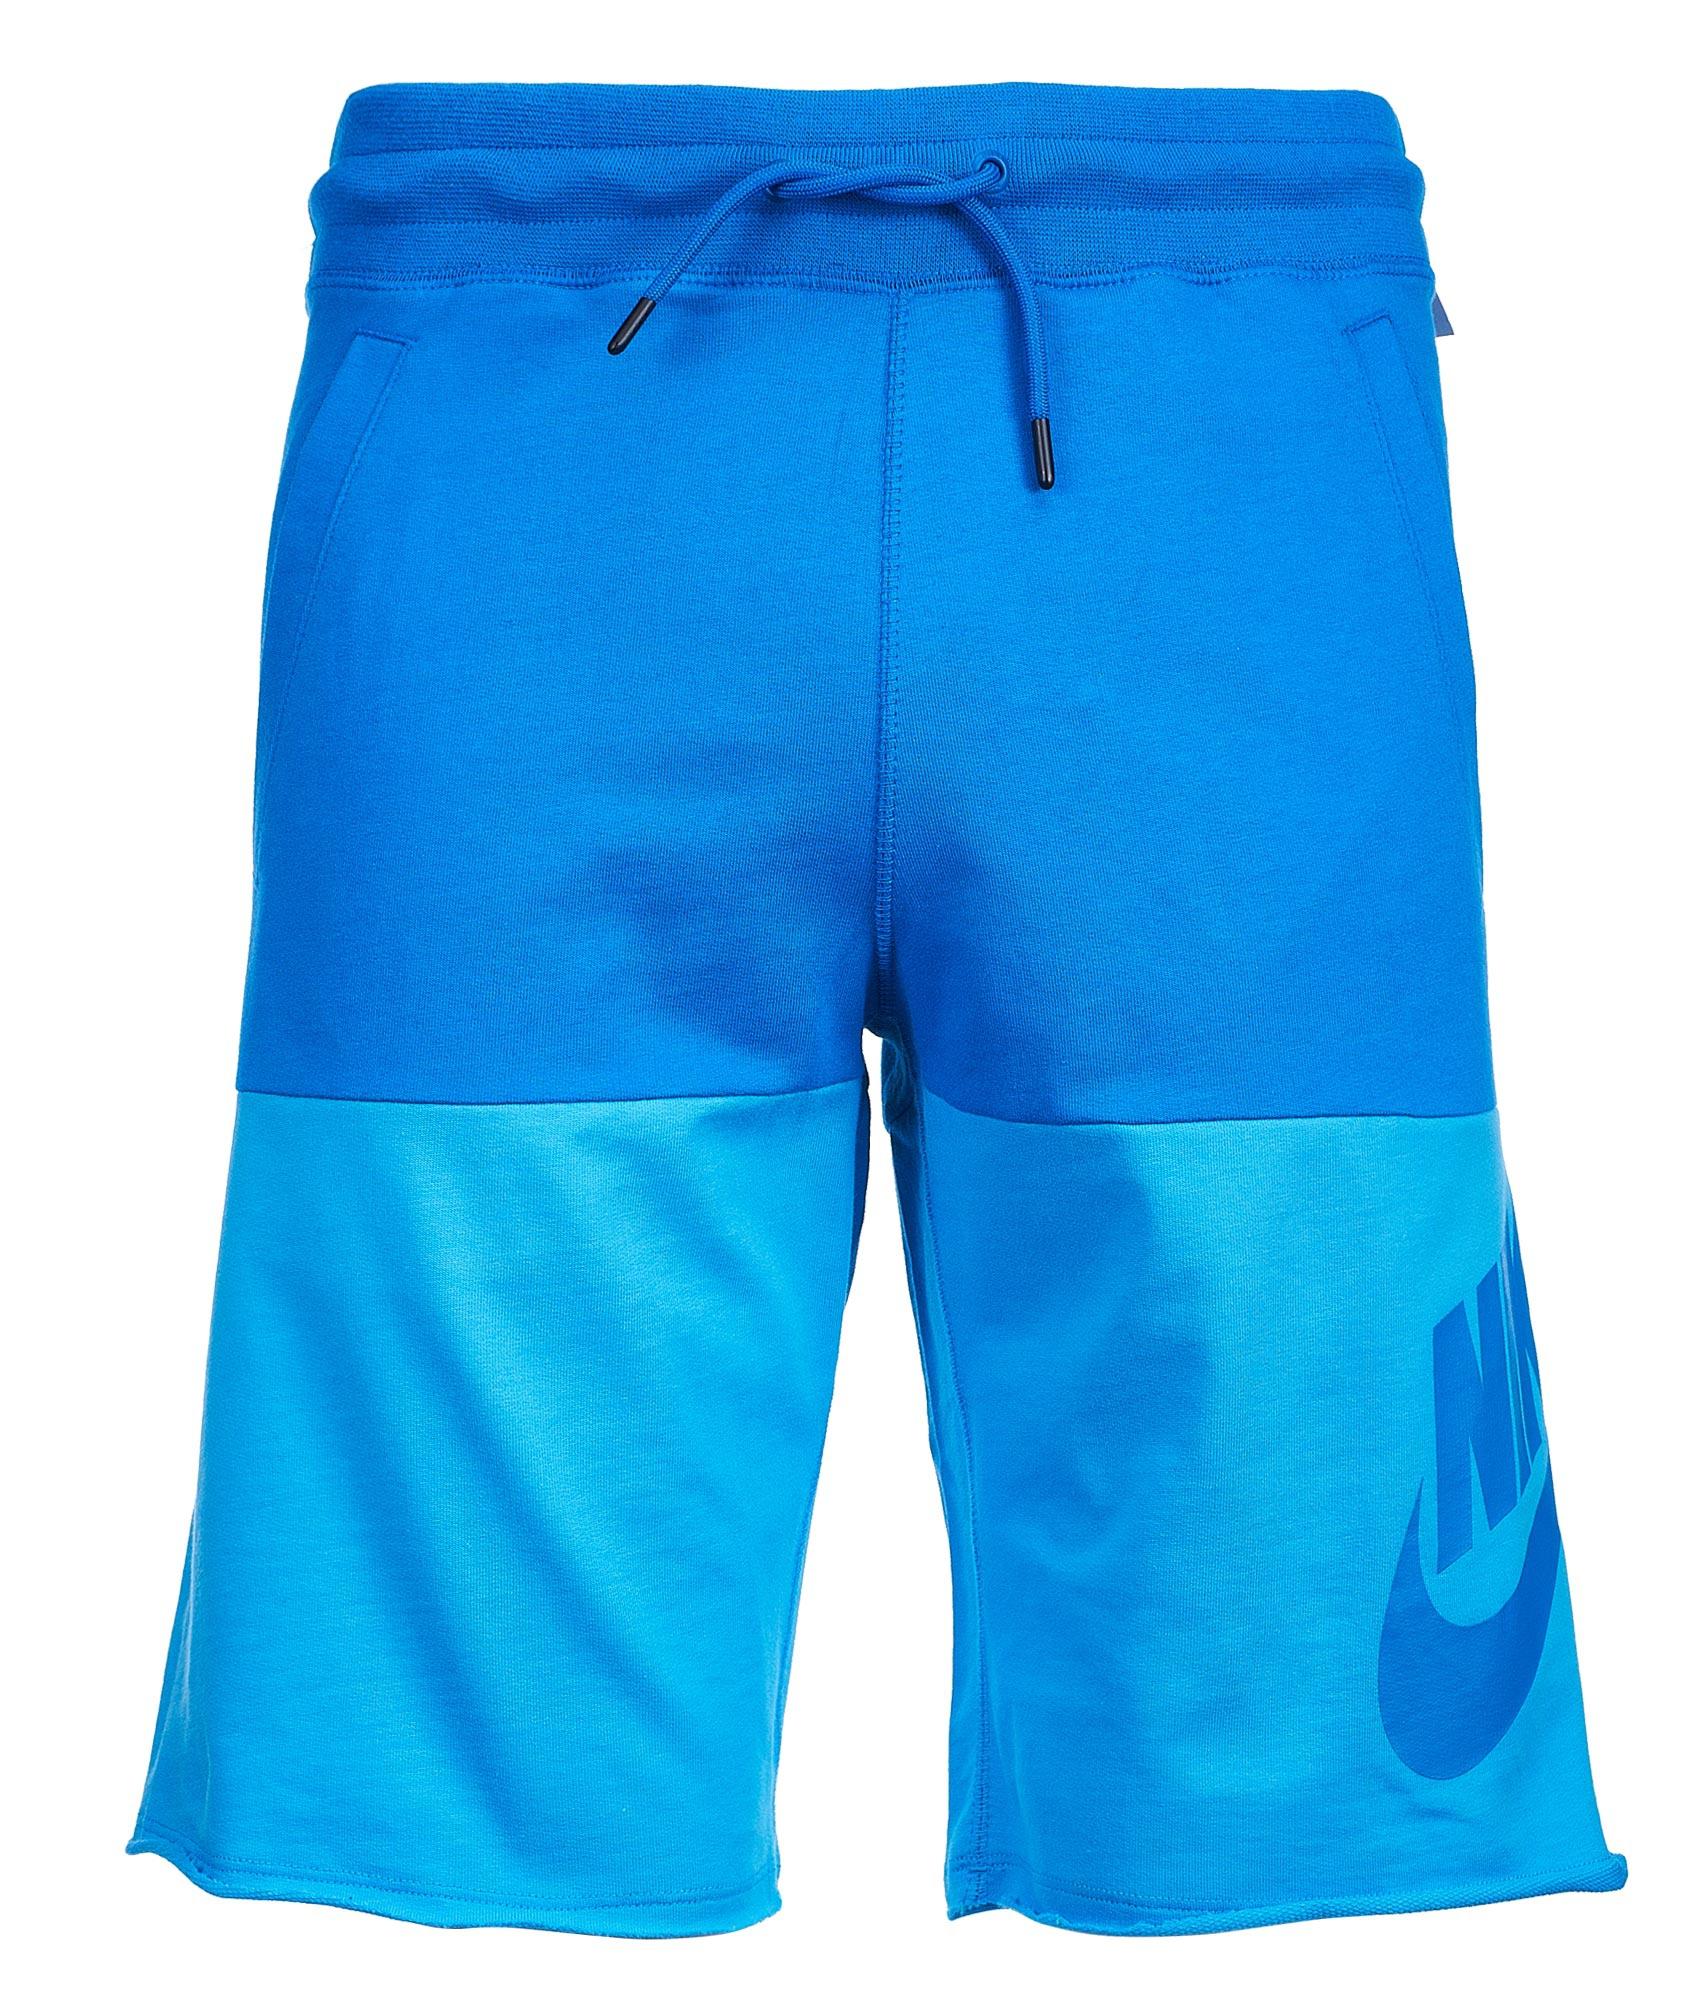 Шорты Nike Nike Цвет-Синий